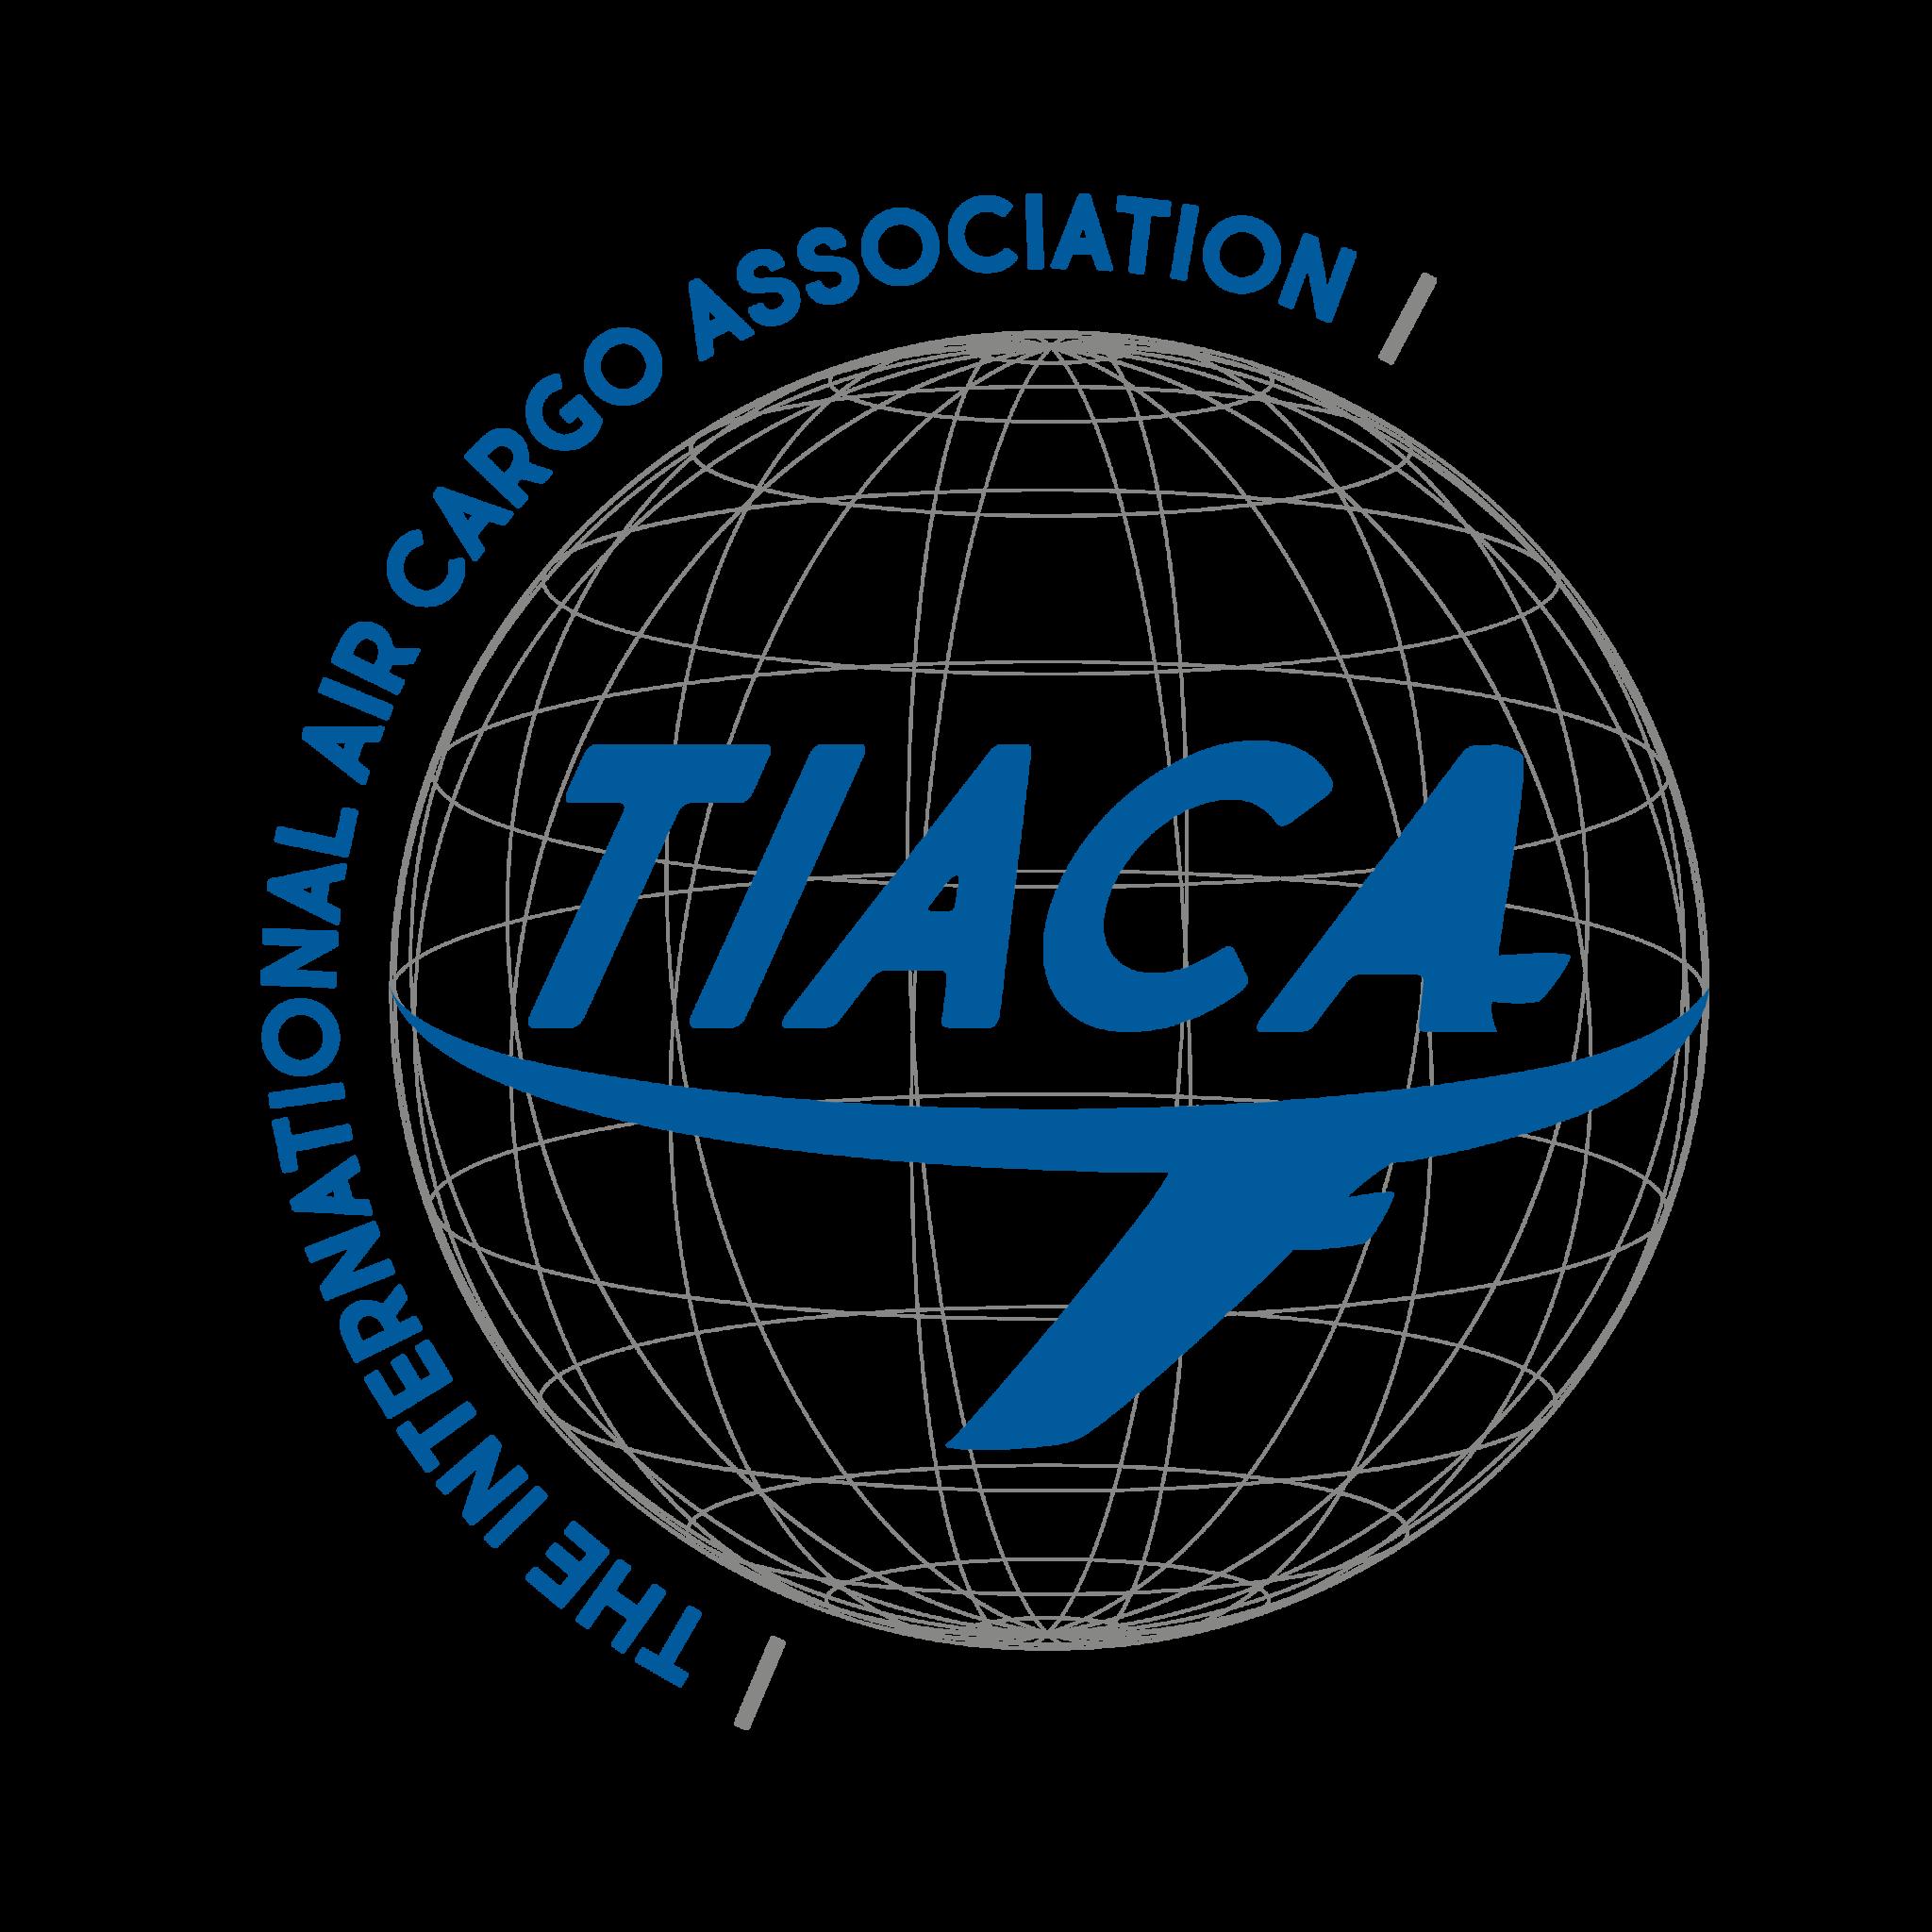 The International Air Cargo Association